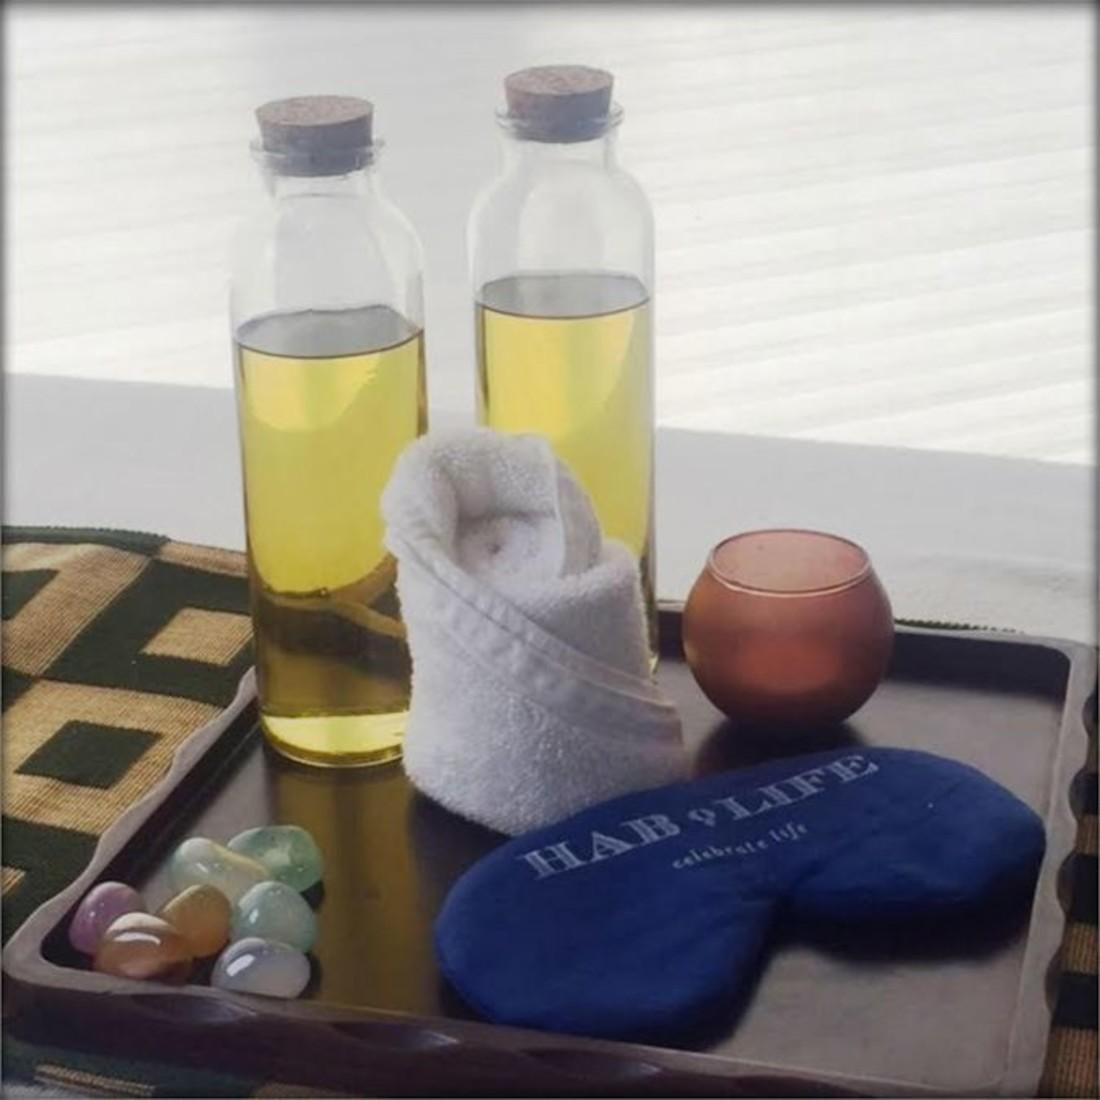 Hablis Hotel Chennai Chennai preblended-massage-oils Spa Hablis Hotel Chennai